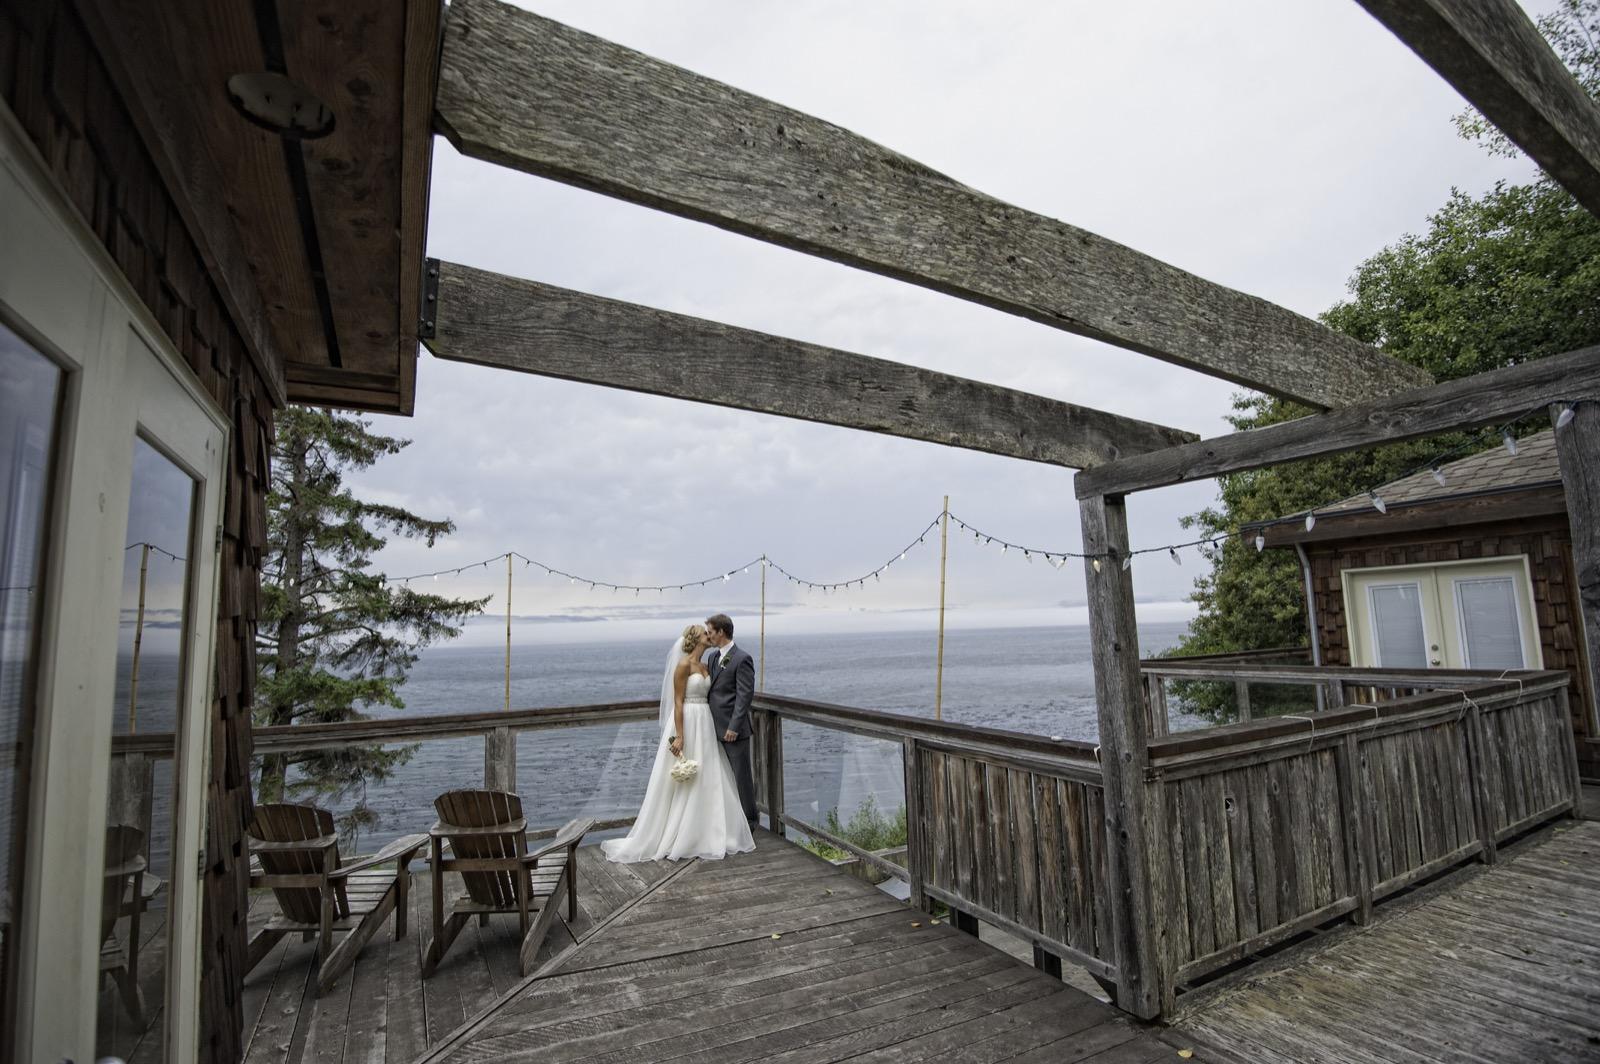 sooke-wedding-photographers-craidelonna-oceanedge-lodge-wedding-61.jpg